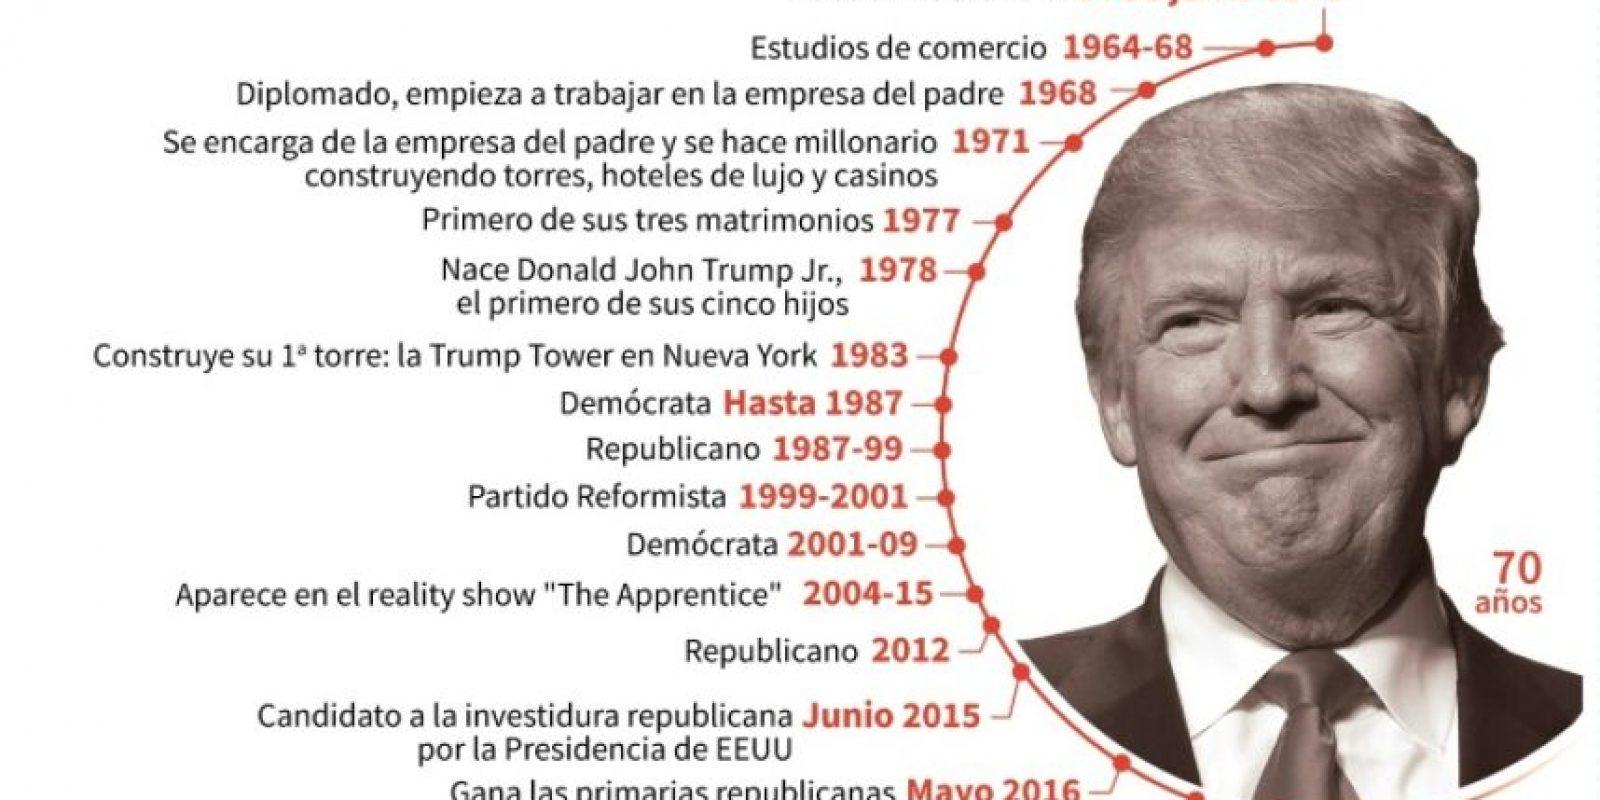 Principales fechas en la vida de Donald Trump Foto:Simon Malfatto, Laurence Saubadu/afp.com